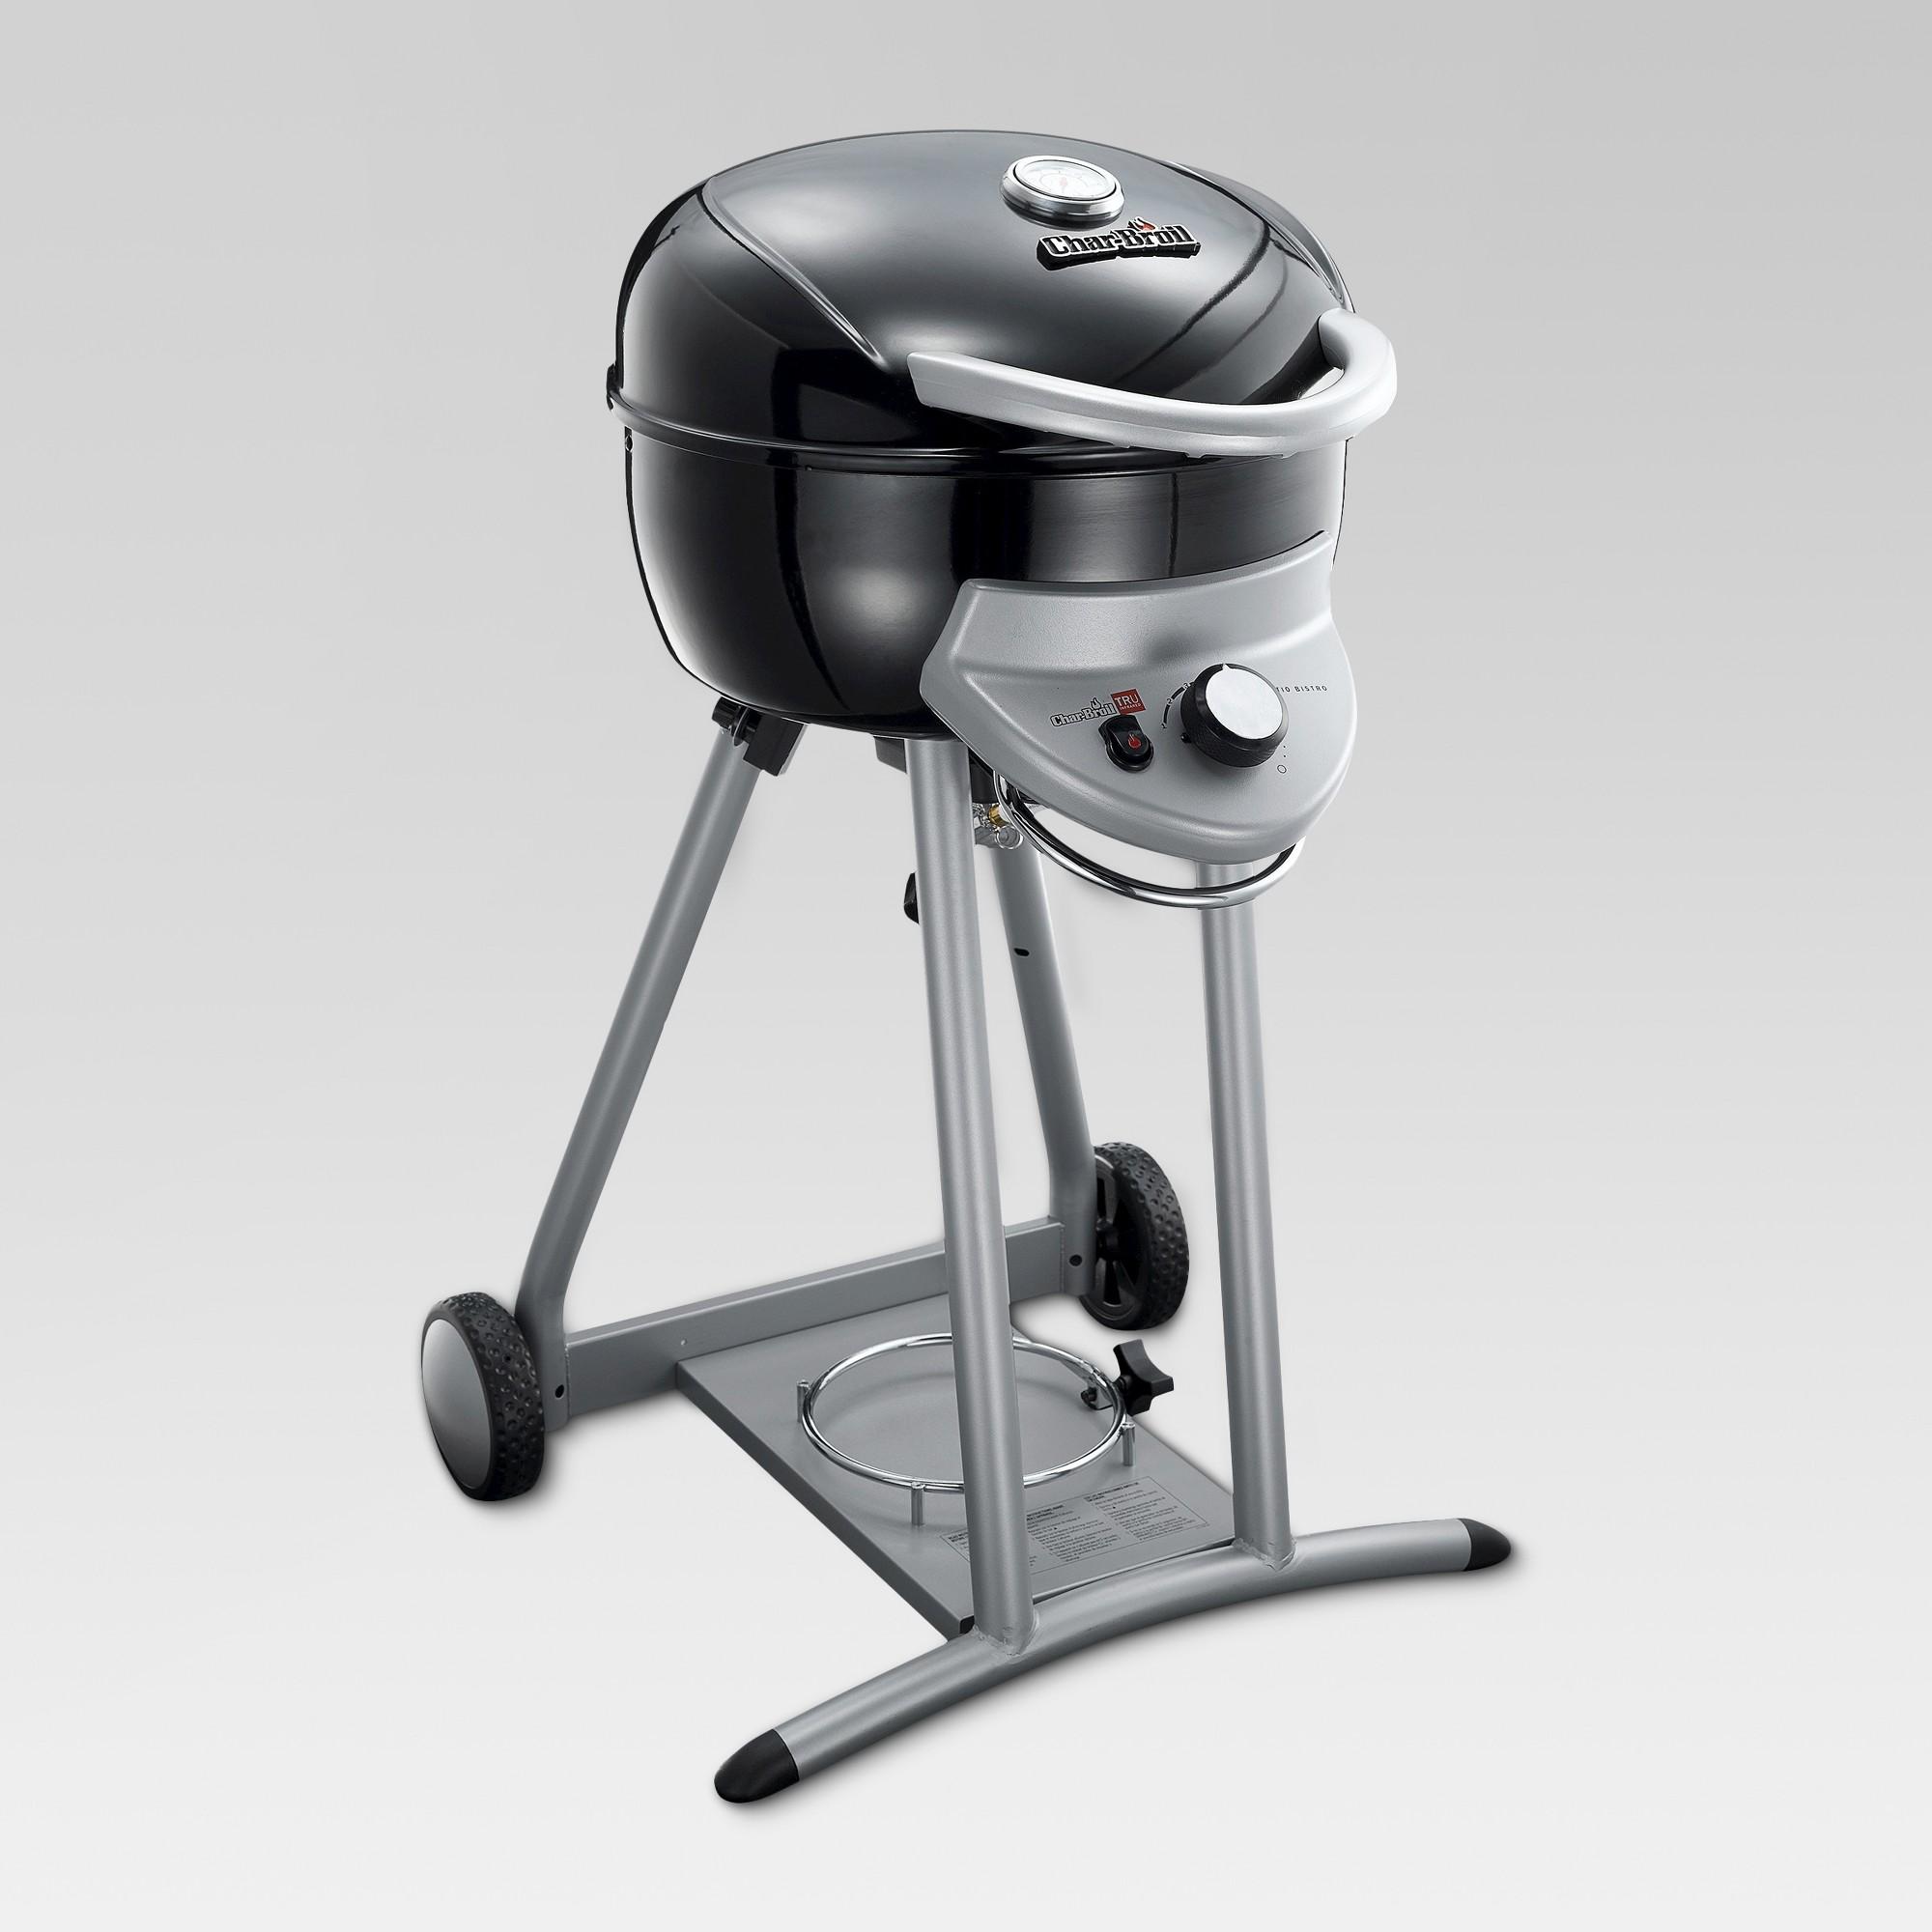 Char Broil Tru Infrared Gas Patio Bistro Deluxe 360 Grill Black